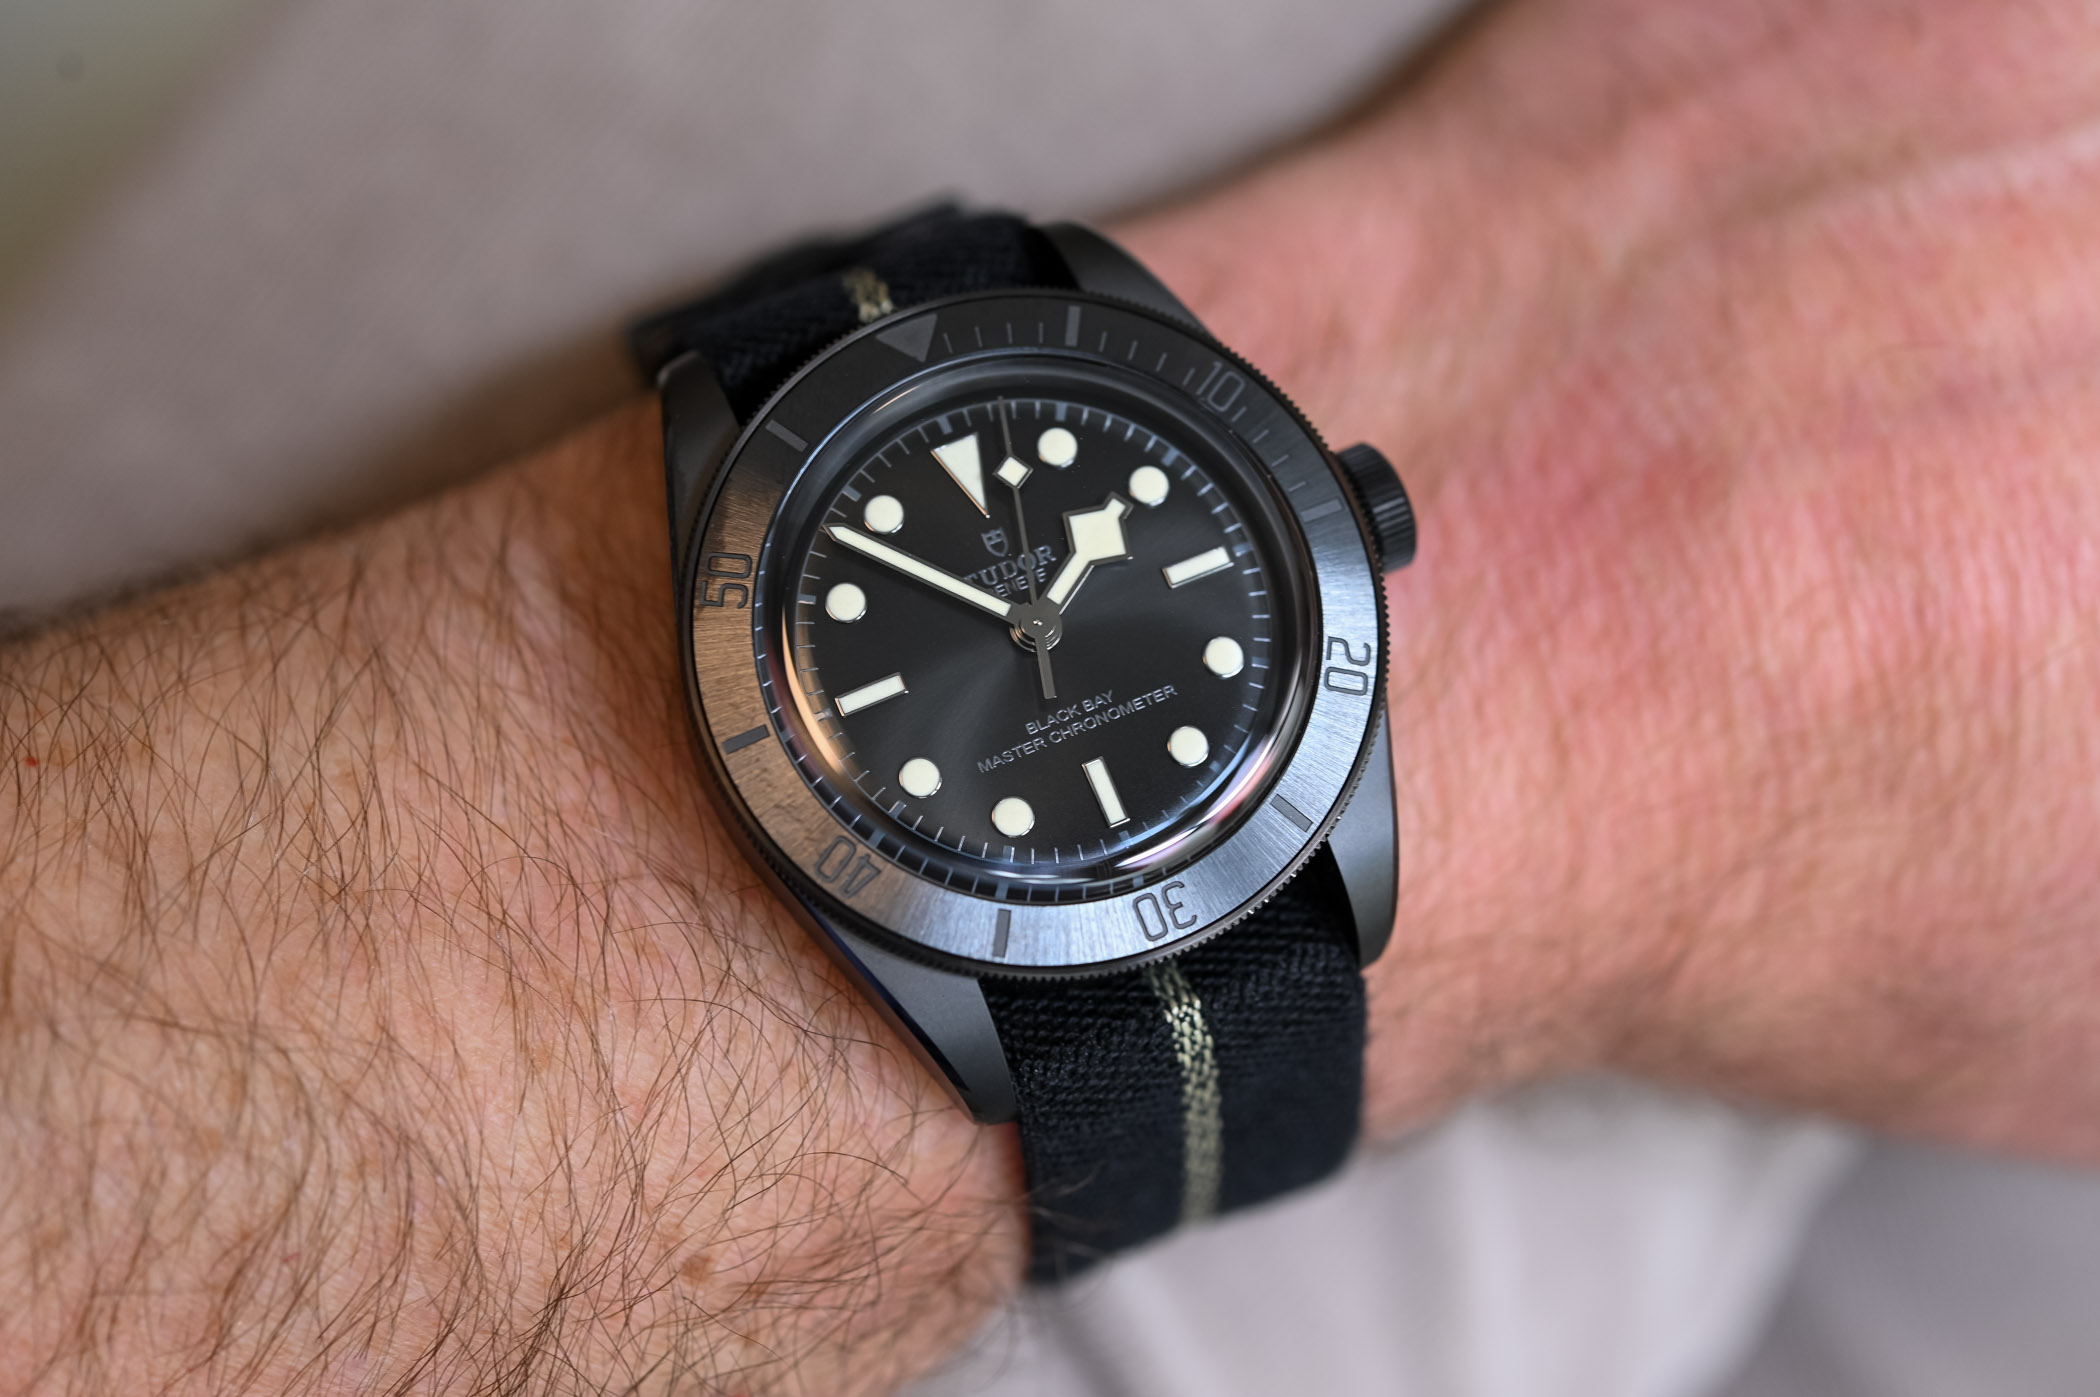 Tudor Black Bay Ceramic Master Chronometer METAS M79210CNU-0001 - review - 7